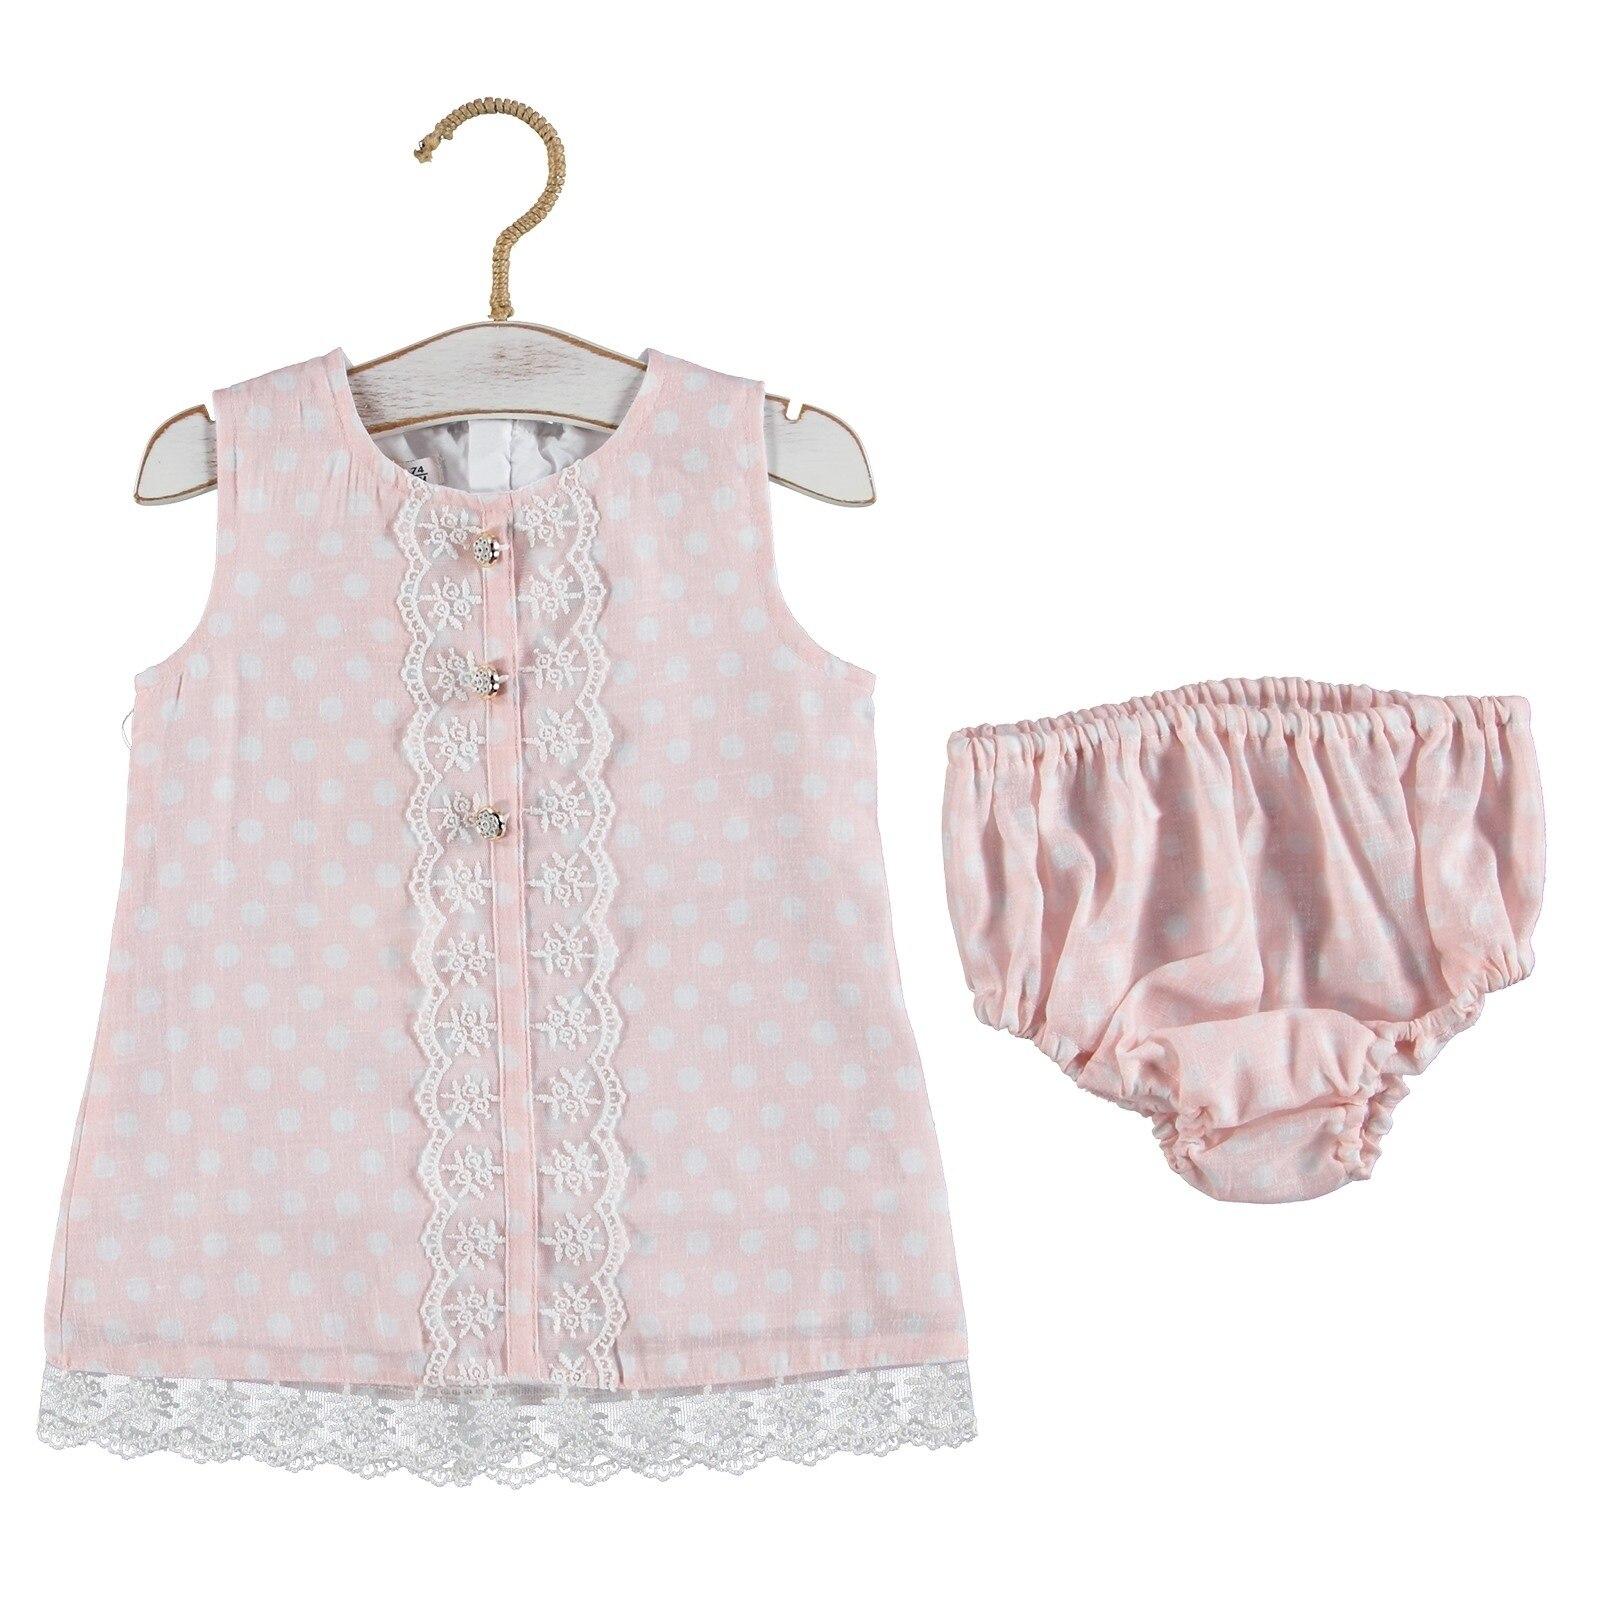 Ebebek Verscon Baby Girl Petter Pan Collar Sleeveless Short Set